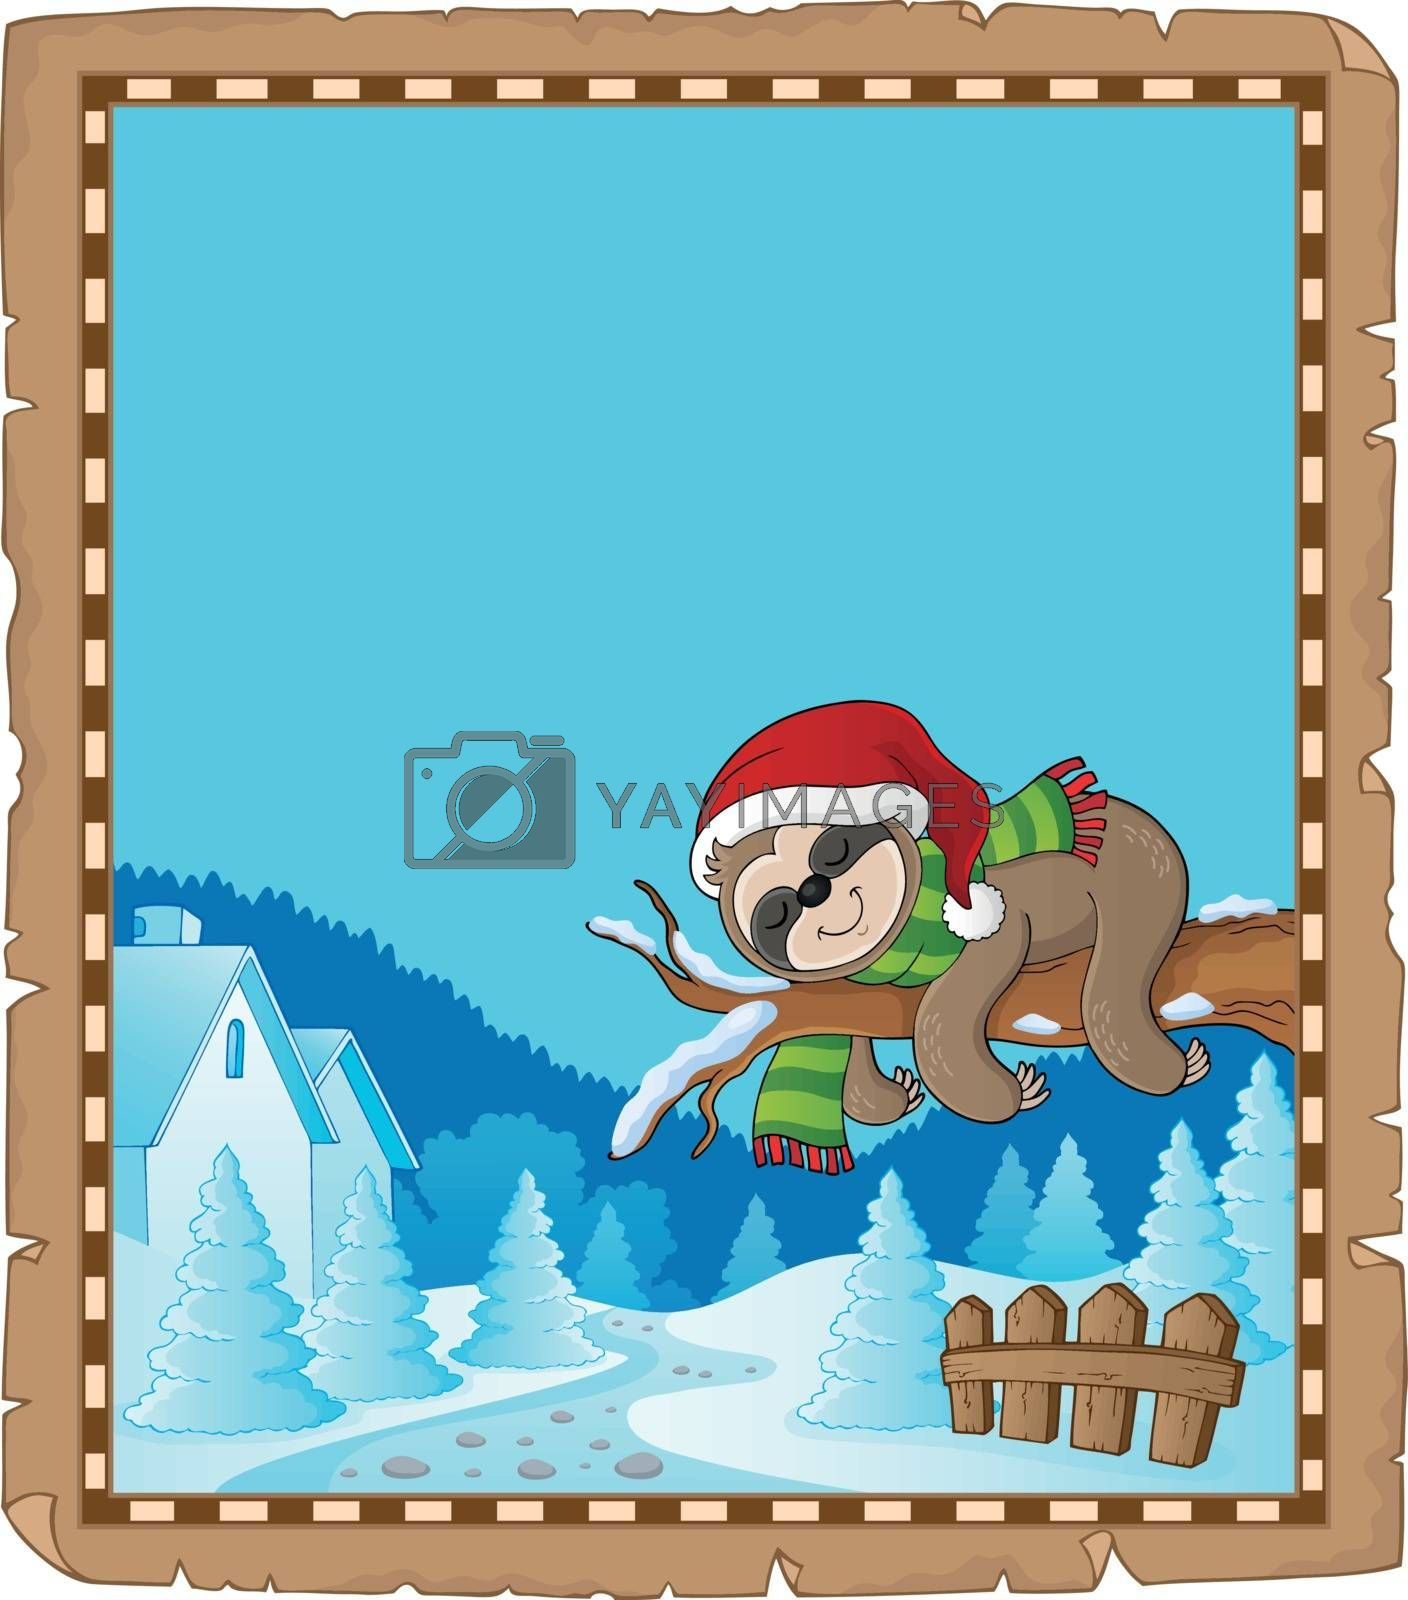 Christmas sloth theme parchment 1 - eps10 vector illustration.